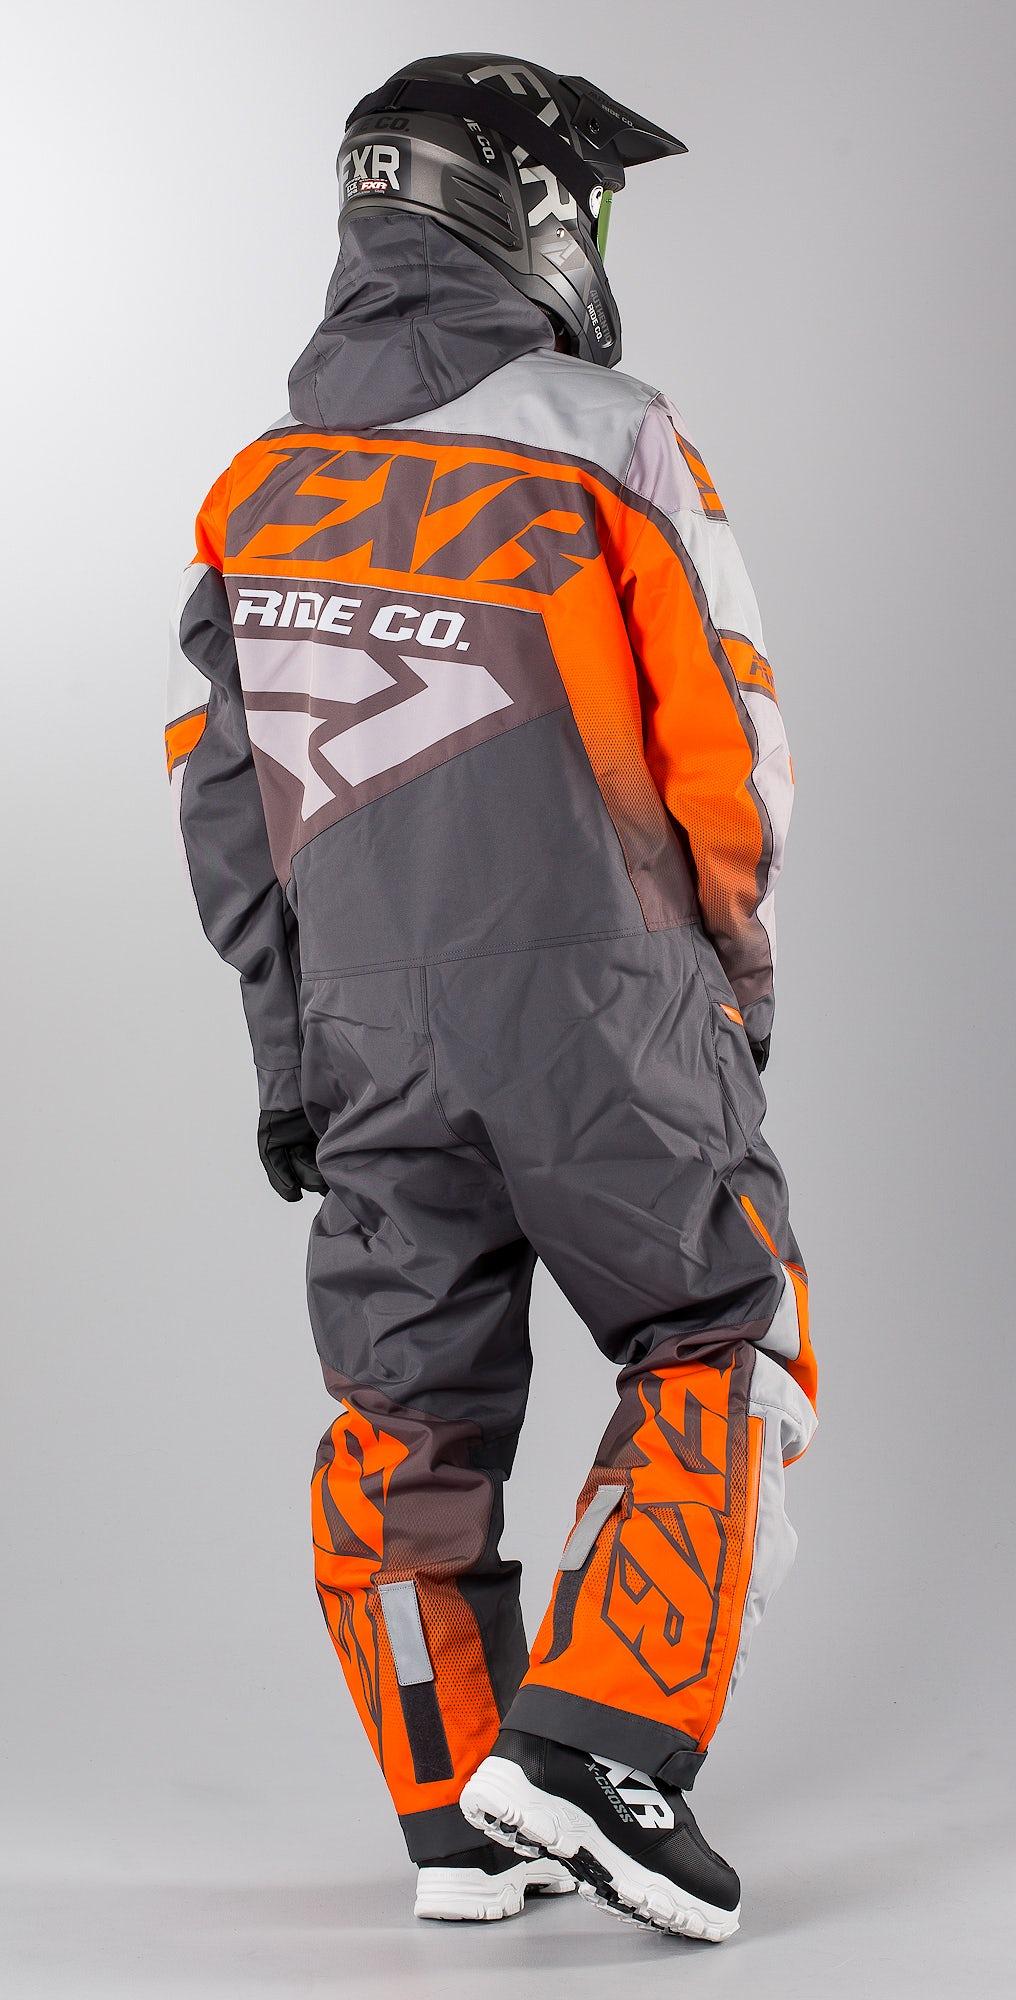 FXR CX Lite Charcoal/Grey/Orange